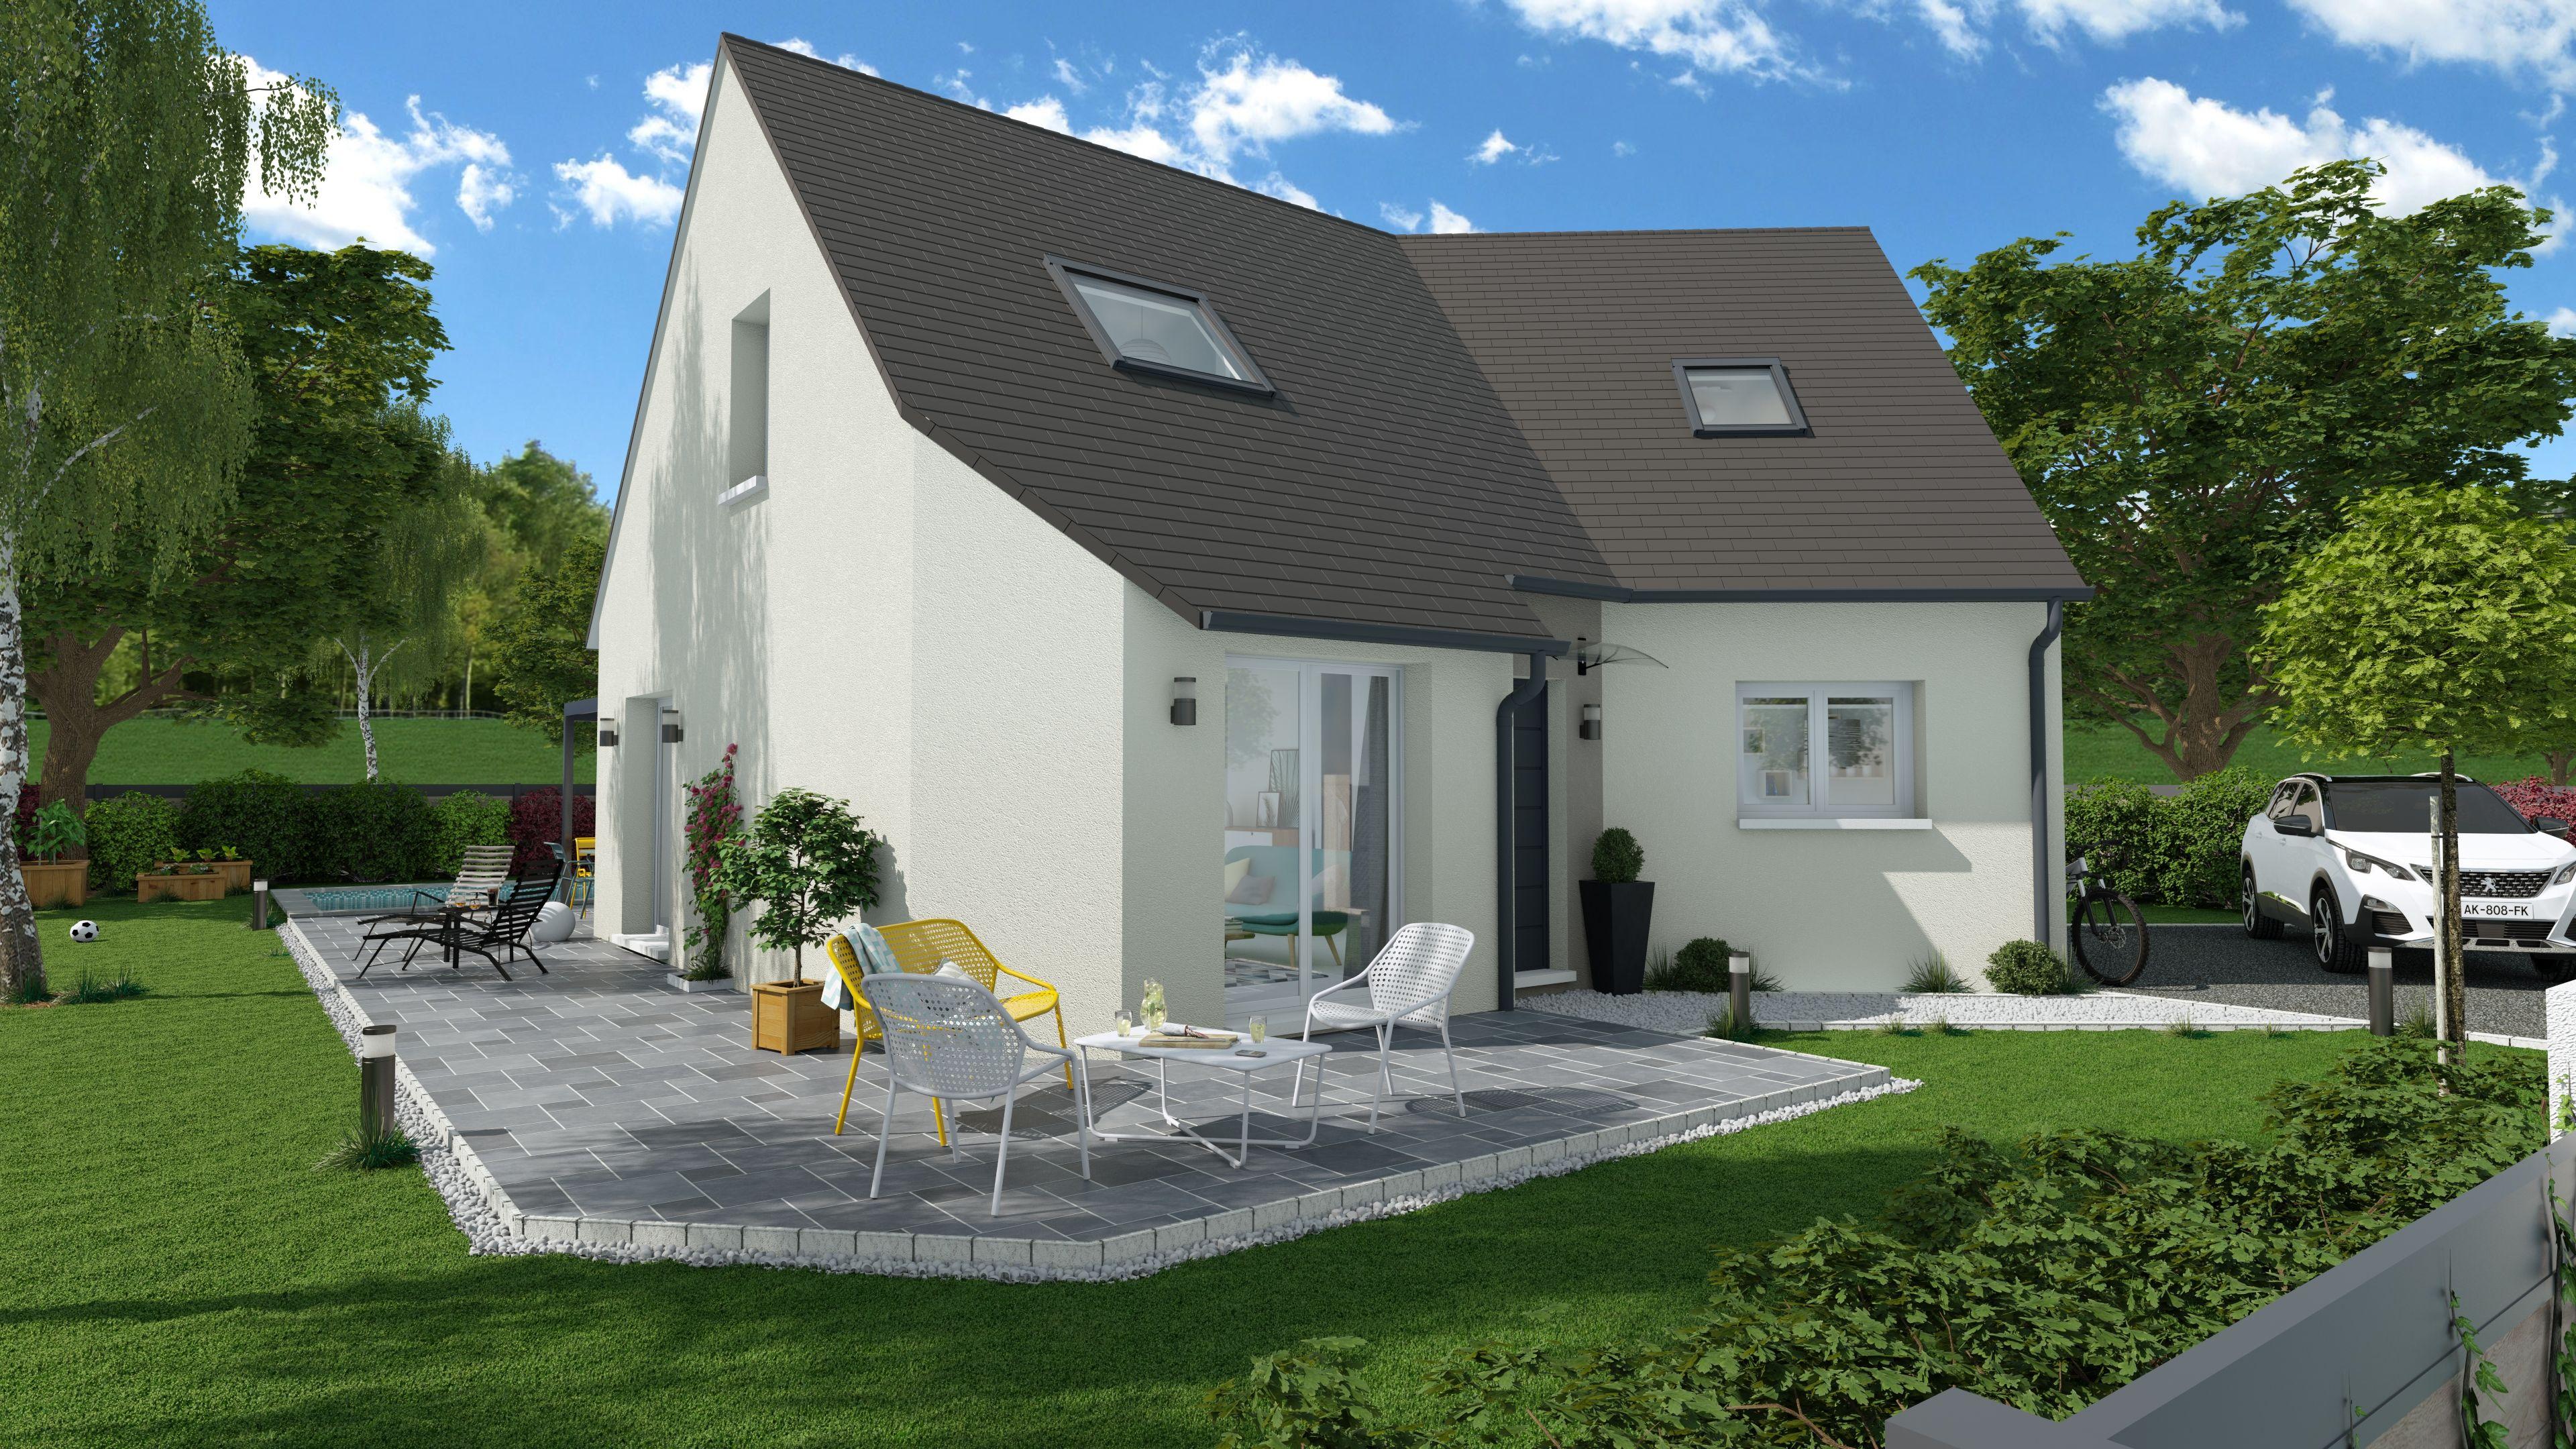 logiciel de construction maison individuelle ventana blog. Black Bedroom Furniture Sets. Home Design Ideas